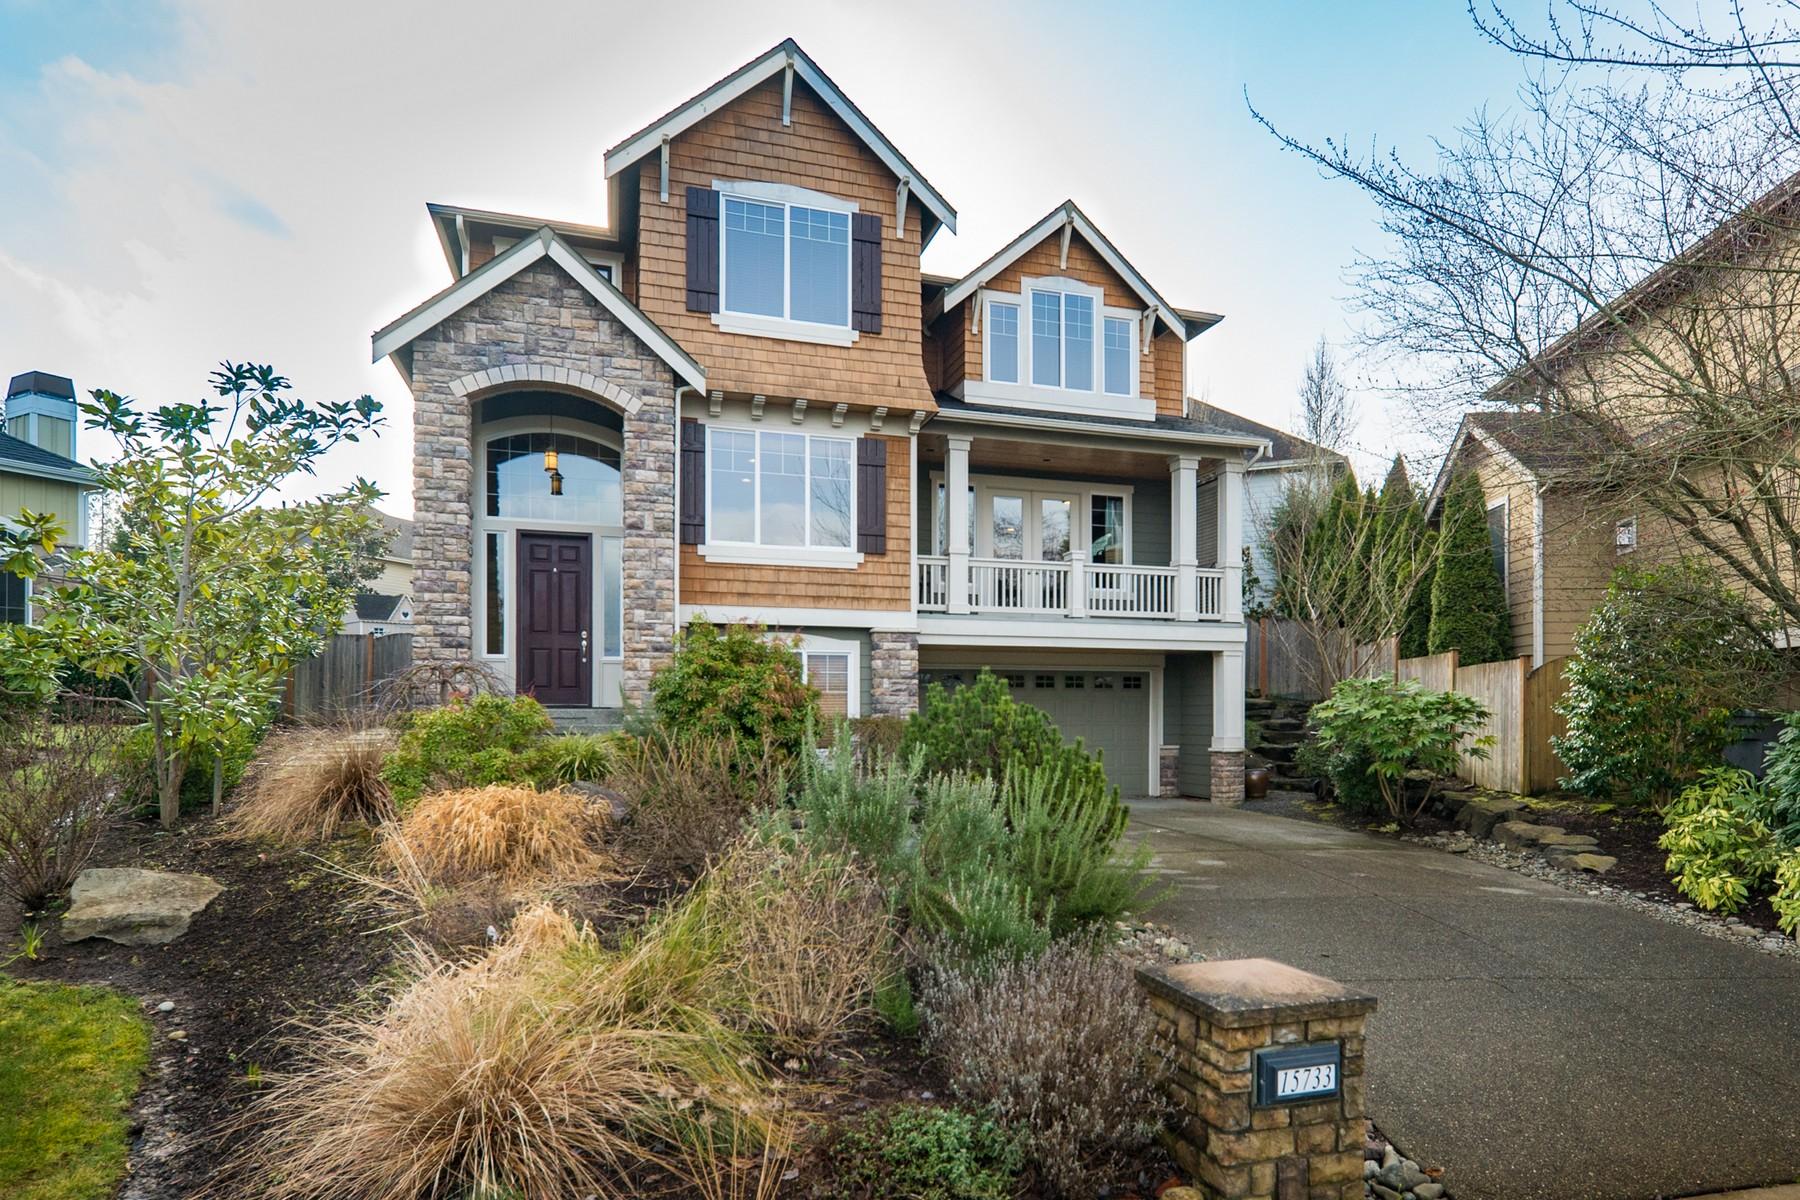 Single Family Home for Sale at Kensington 15733 NE 119th Ct Redmond, Washington 98052 United States